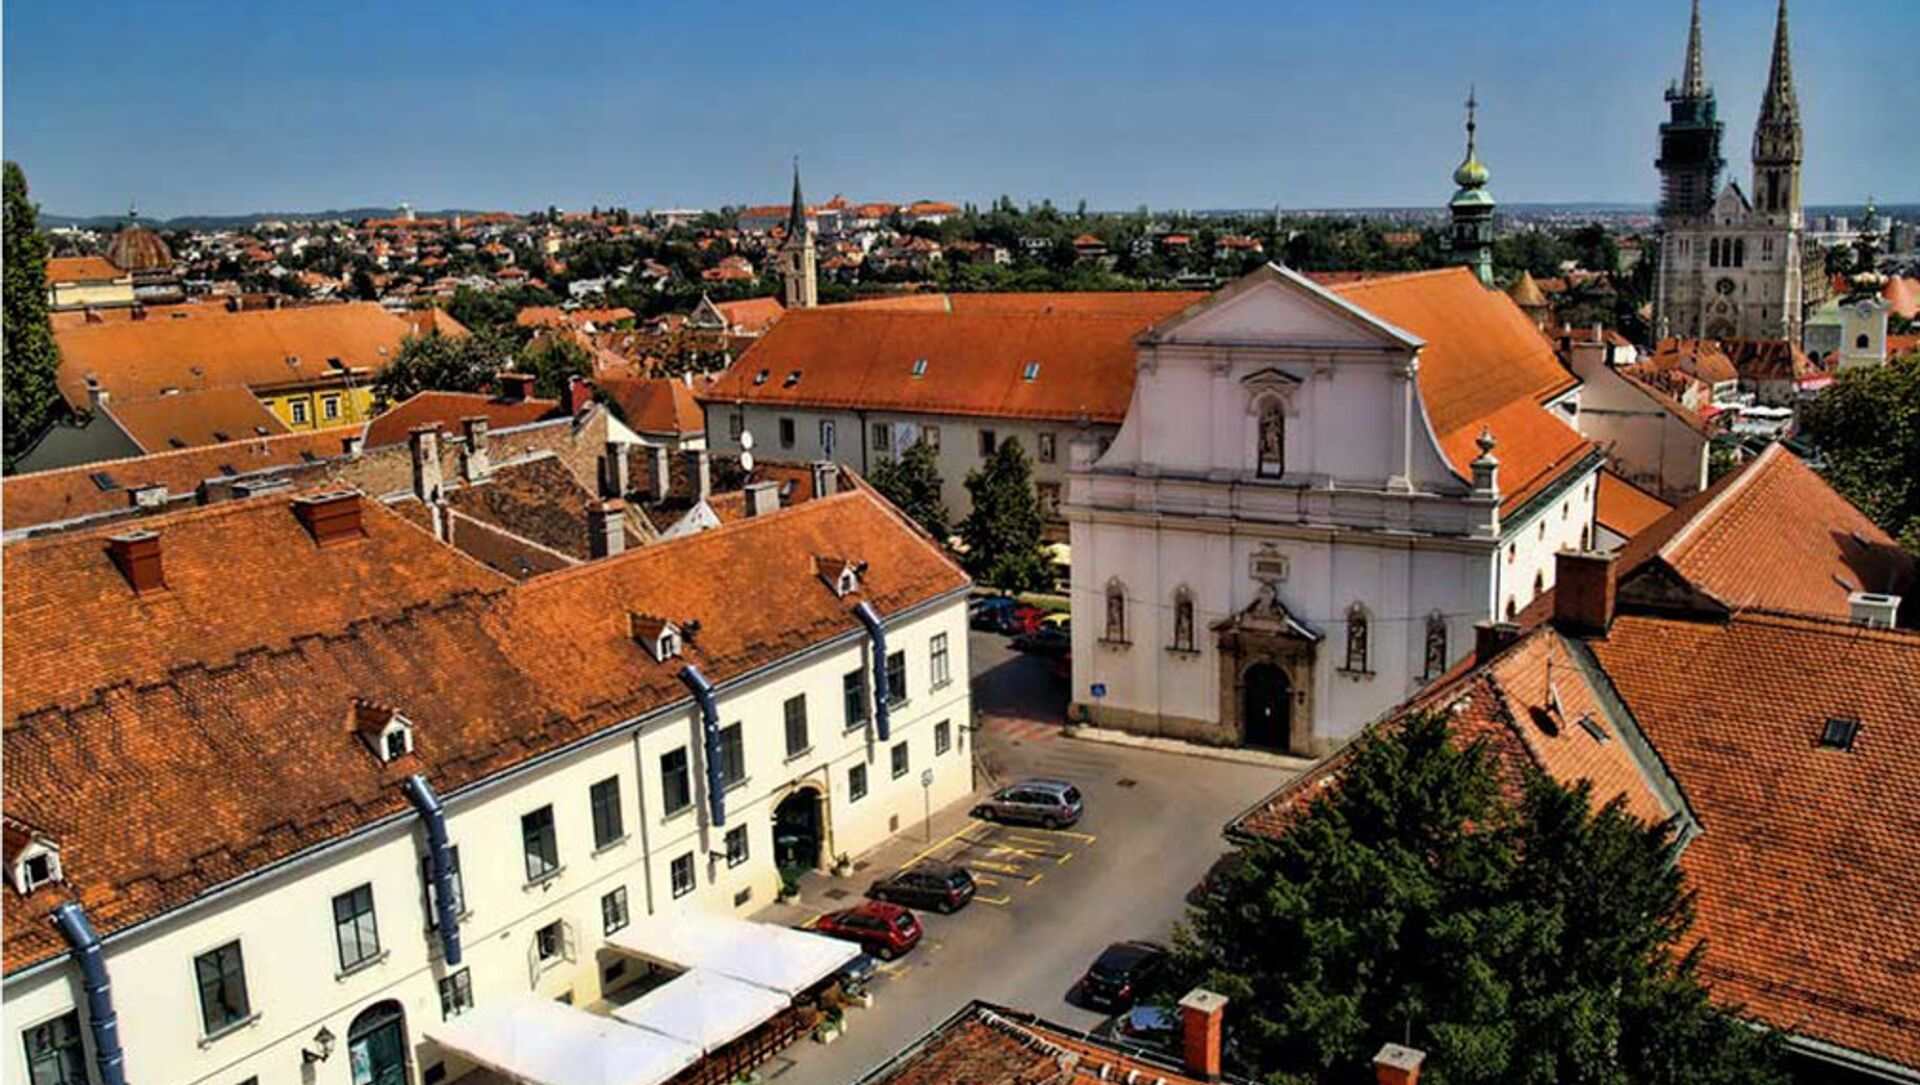 Панорама Загреба - Sputnik Србија, 1920, 16.05.2021